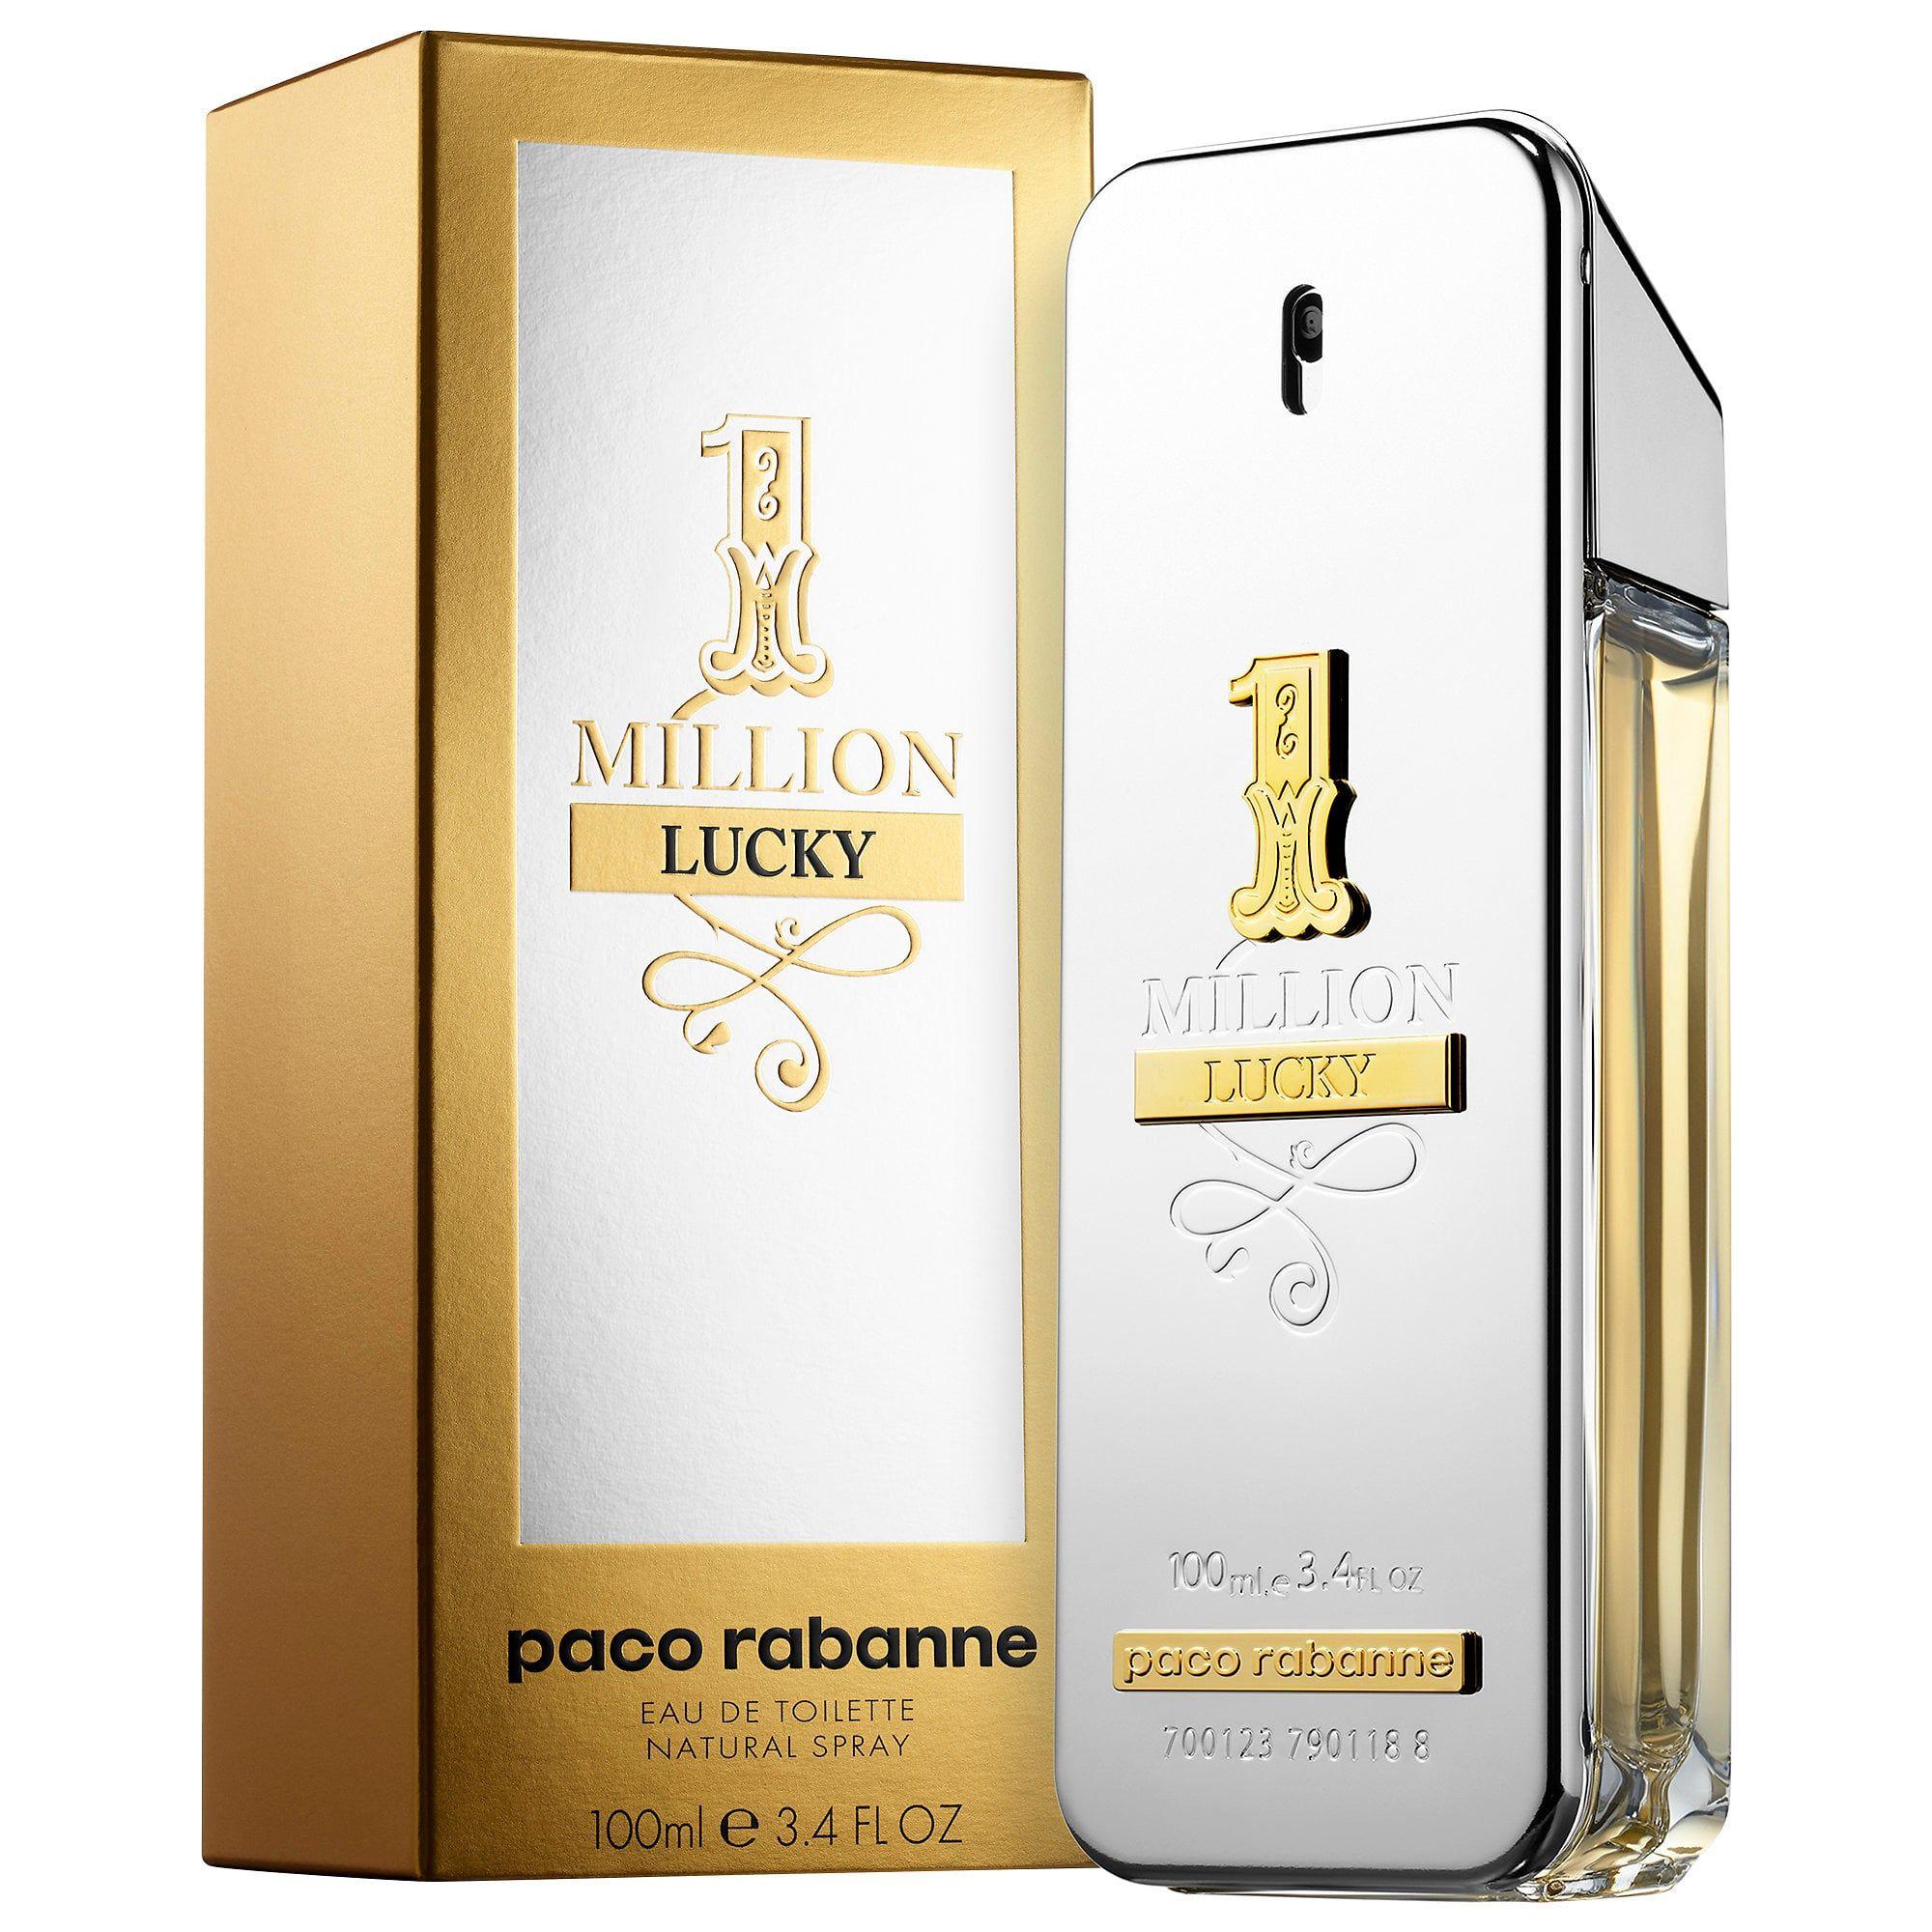 Paco Rabanne 1 Million Lucky Eau De Toilette Spray - 100ml